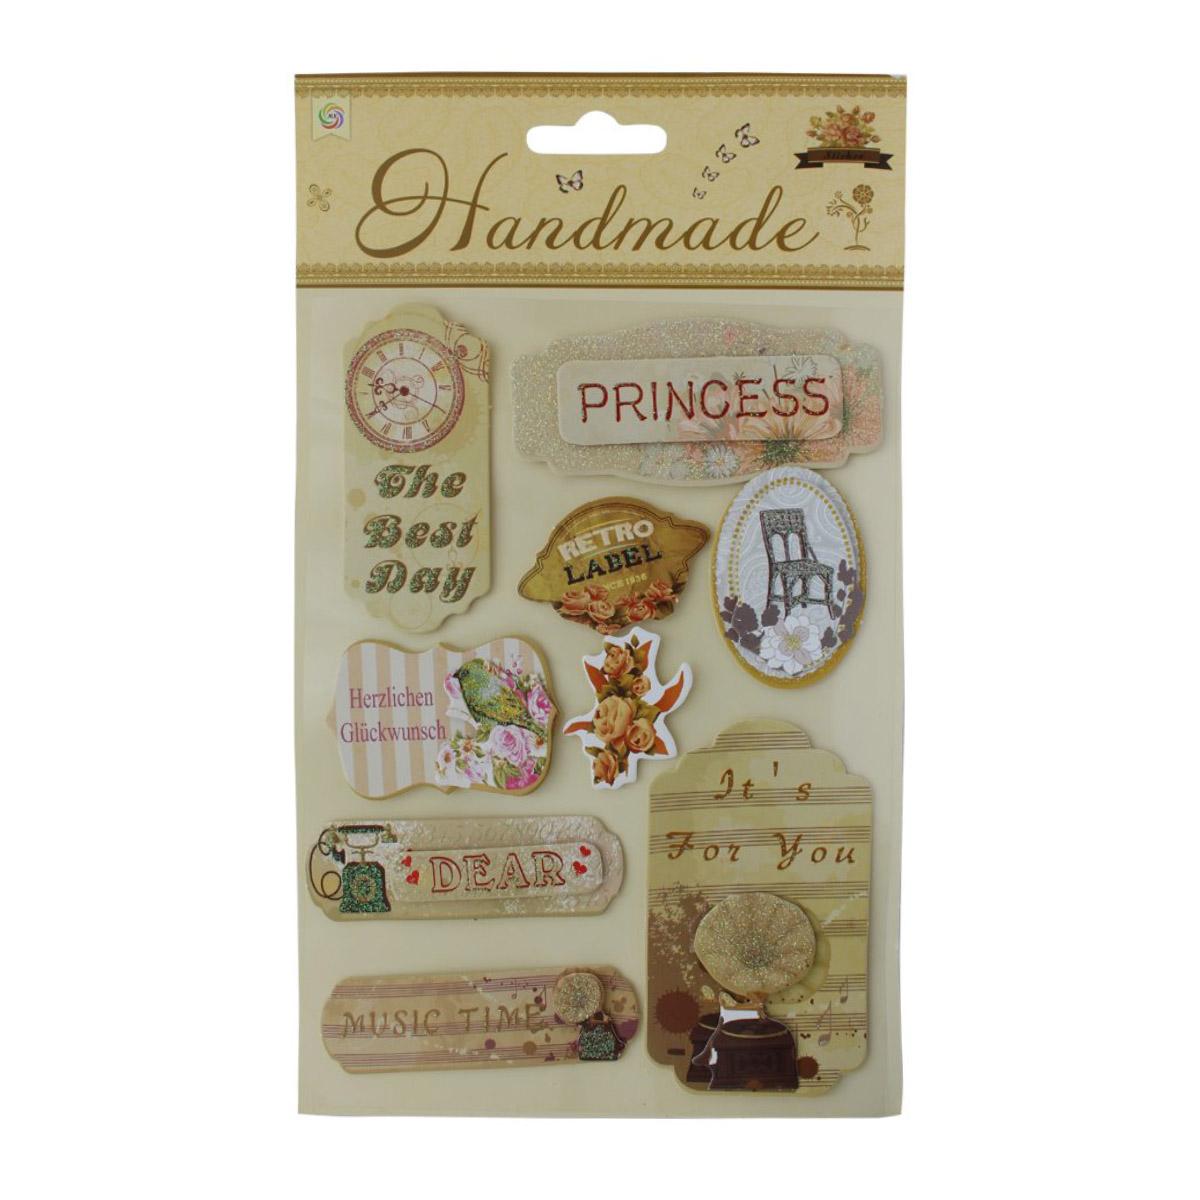 VIP-M012 Наклейки 3D 'Handmade' Принцесса